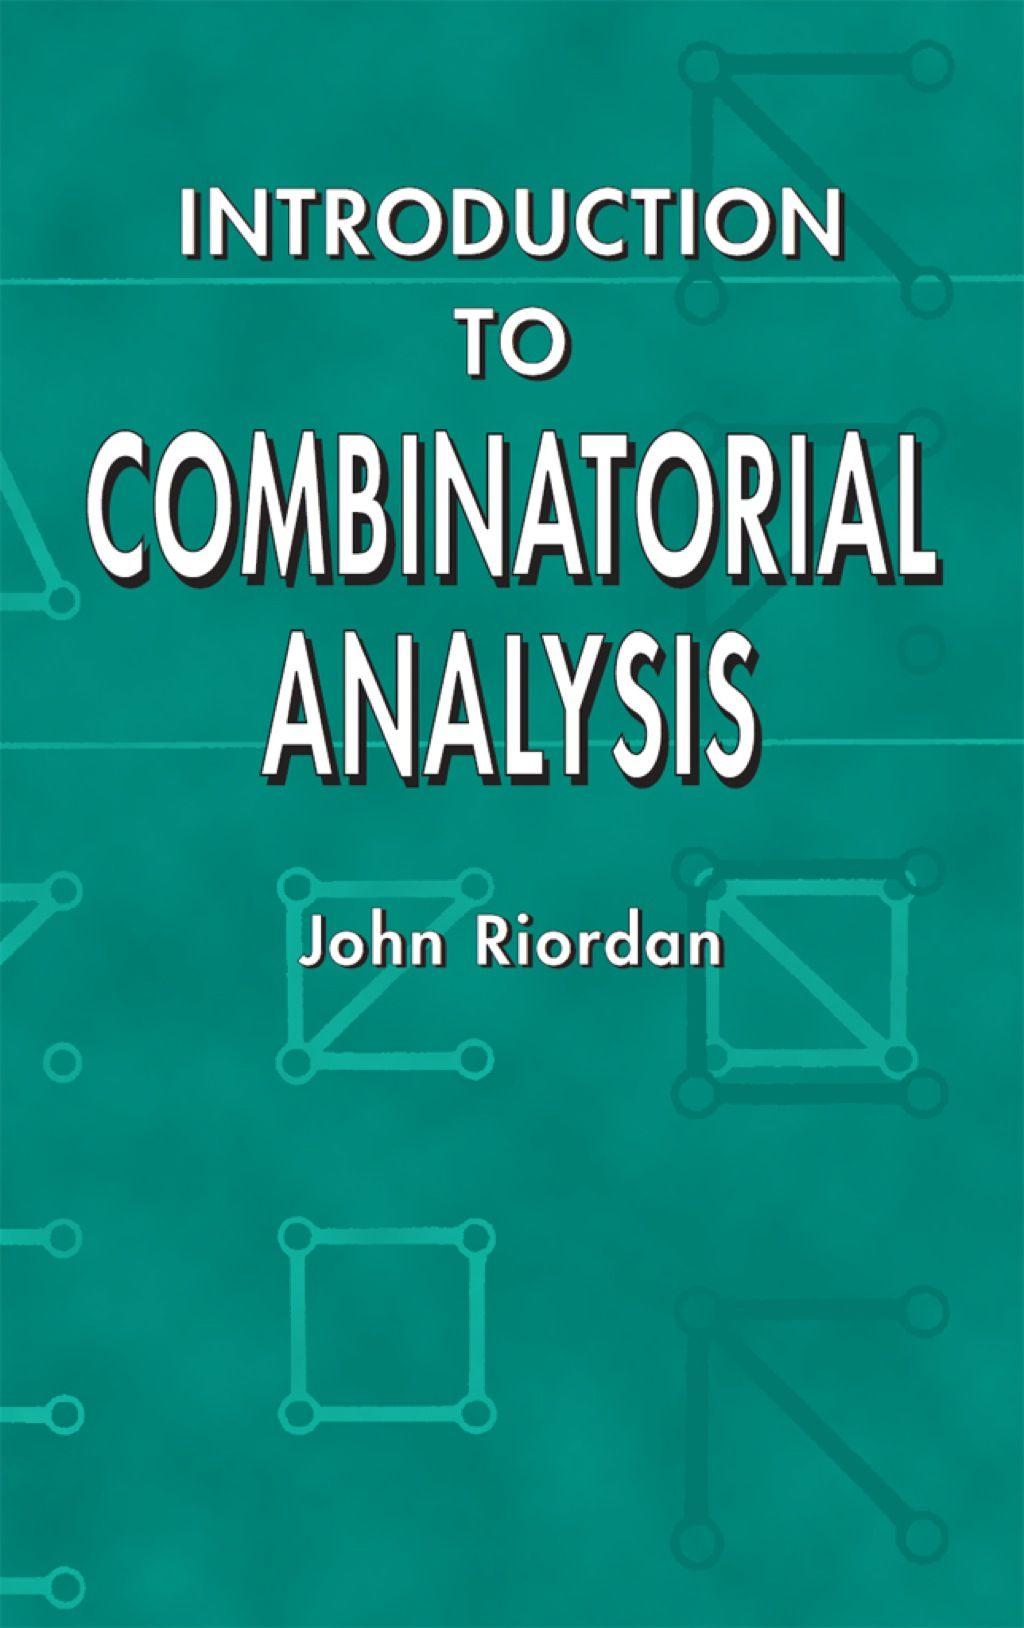 Introduction To Combinatorial Analysi Ebook Dissertation Writing Service Academic Increase Knowledge Undergraduate Mathematic